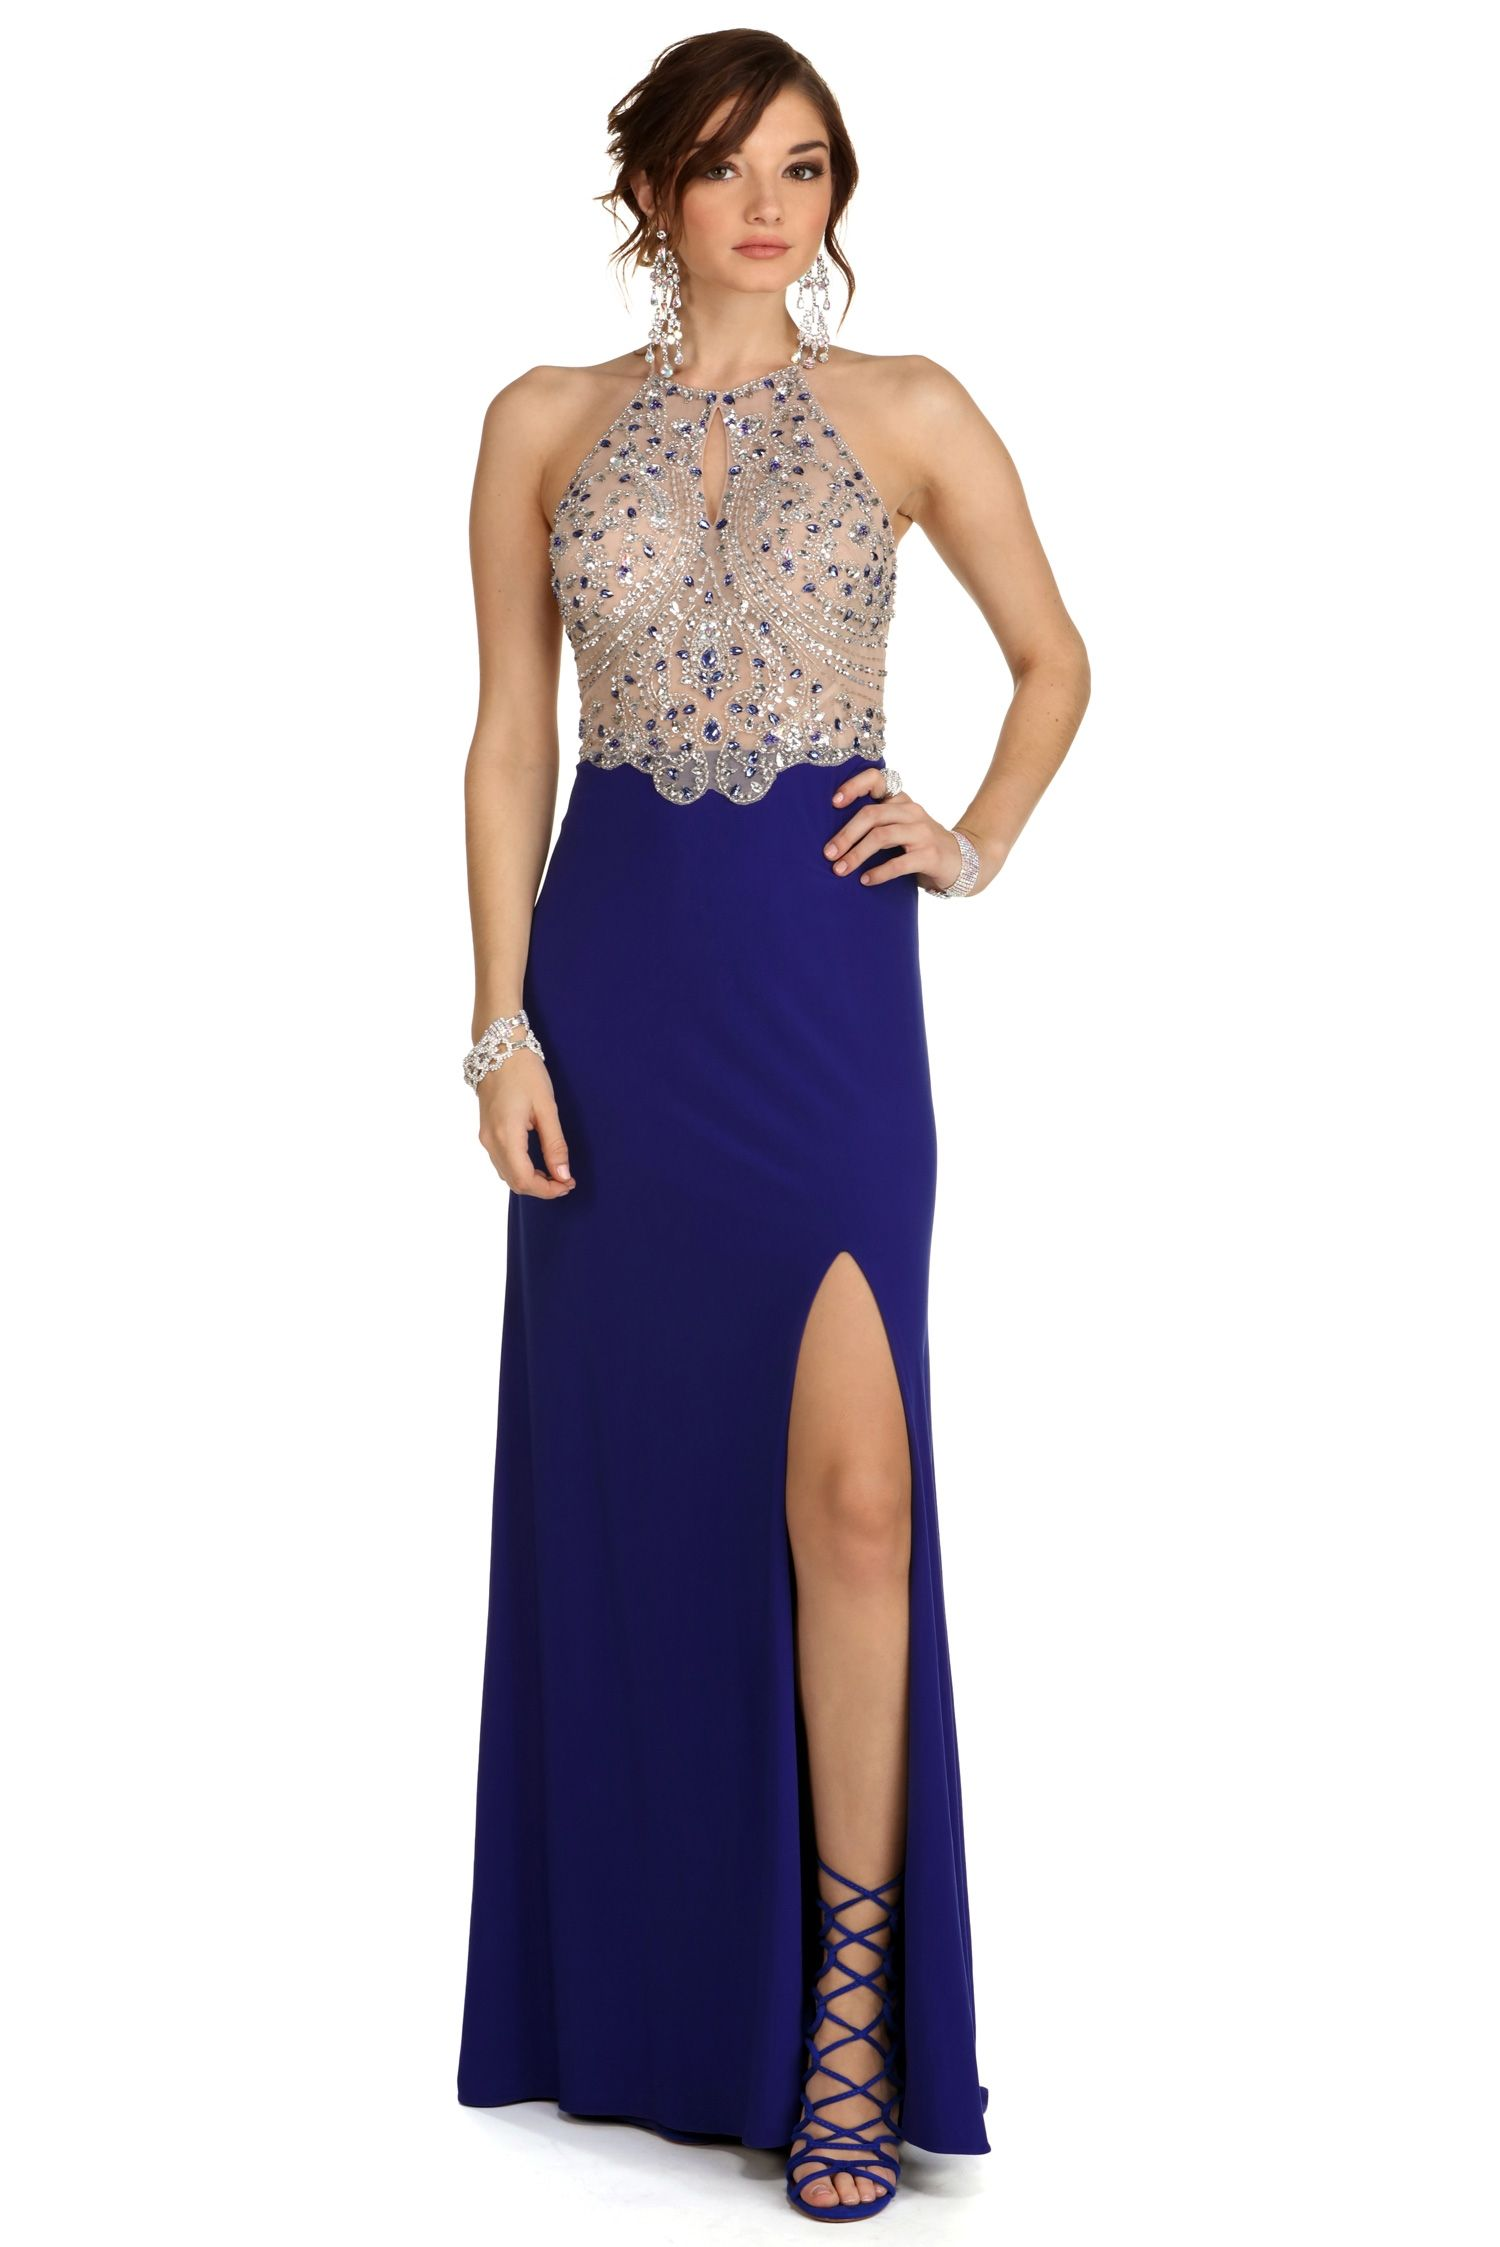 759730f2e13 Blake Blue Jeweled Prom Dress